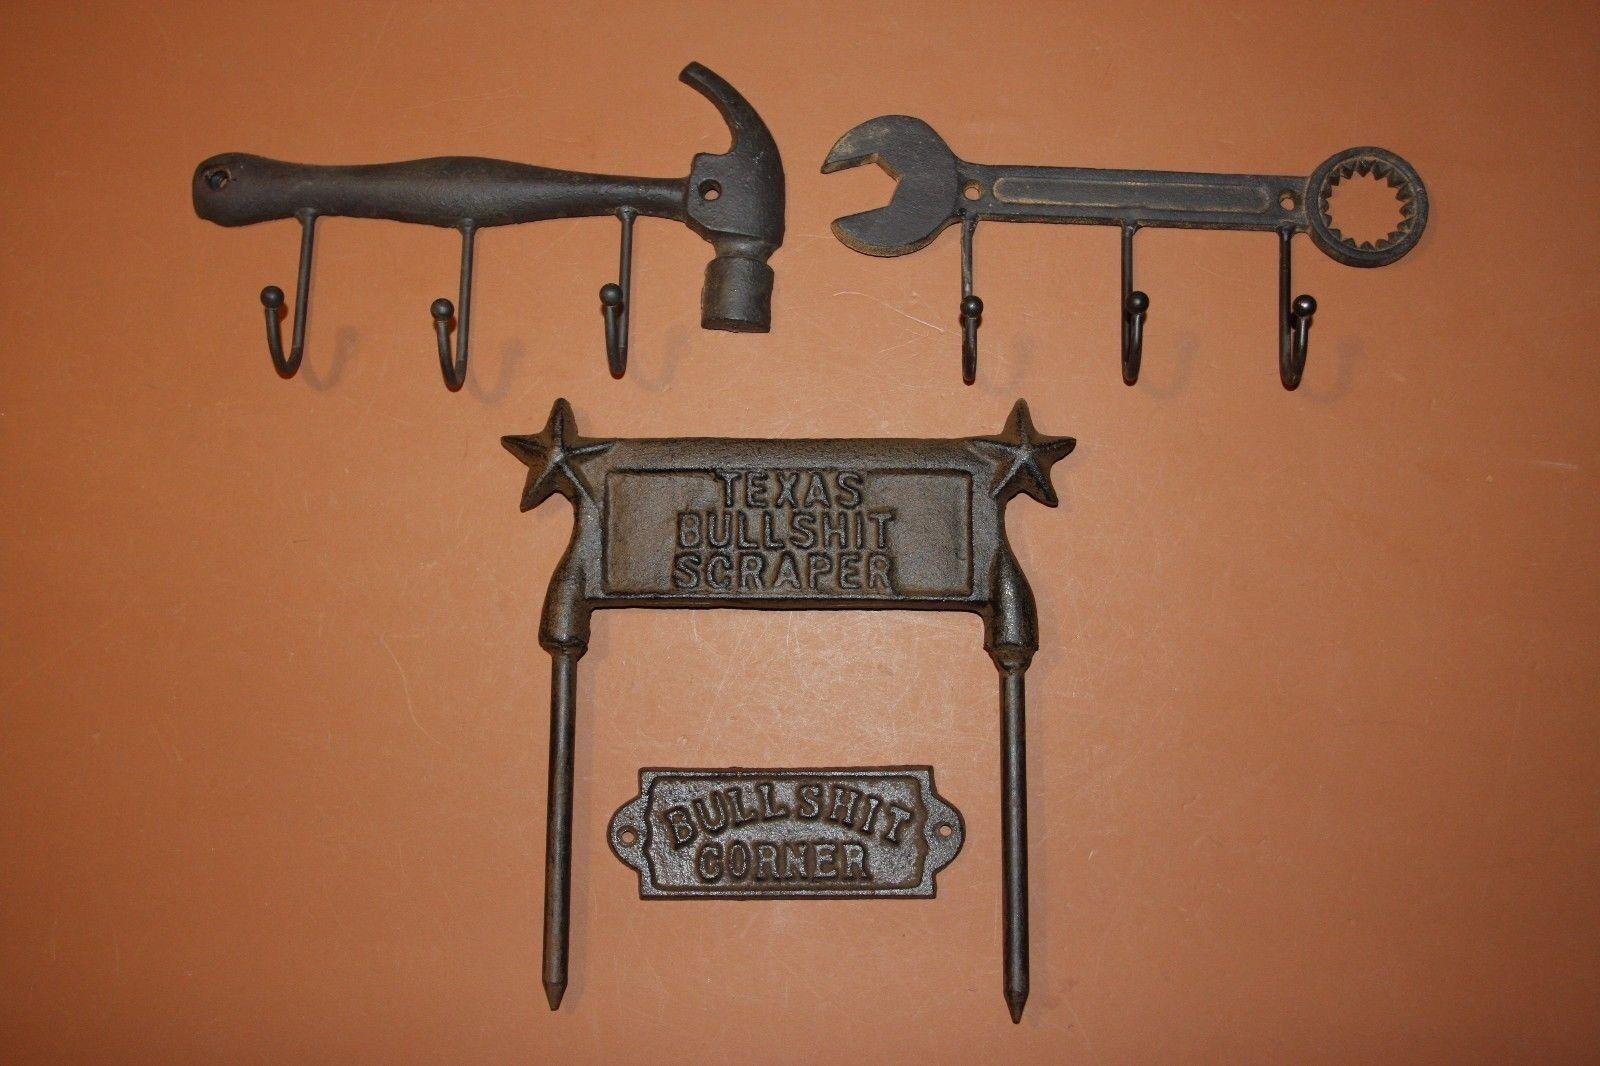 (4) Vintage-look Rustic Tools Coat Hat Wall Hooks, Cast Iron, BS Corner Sign